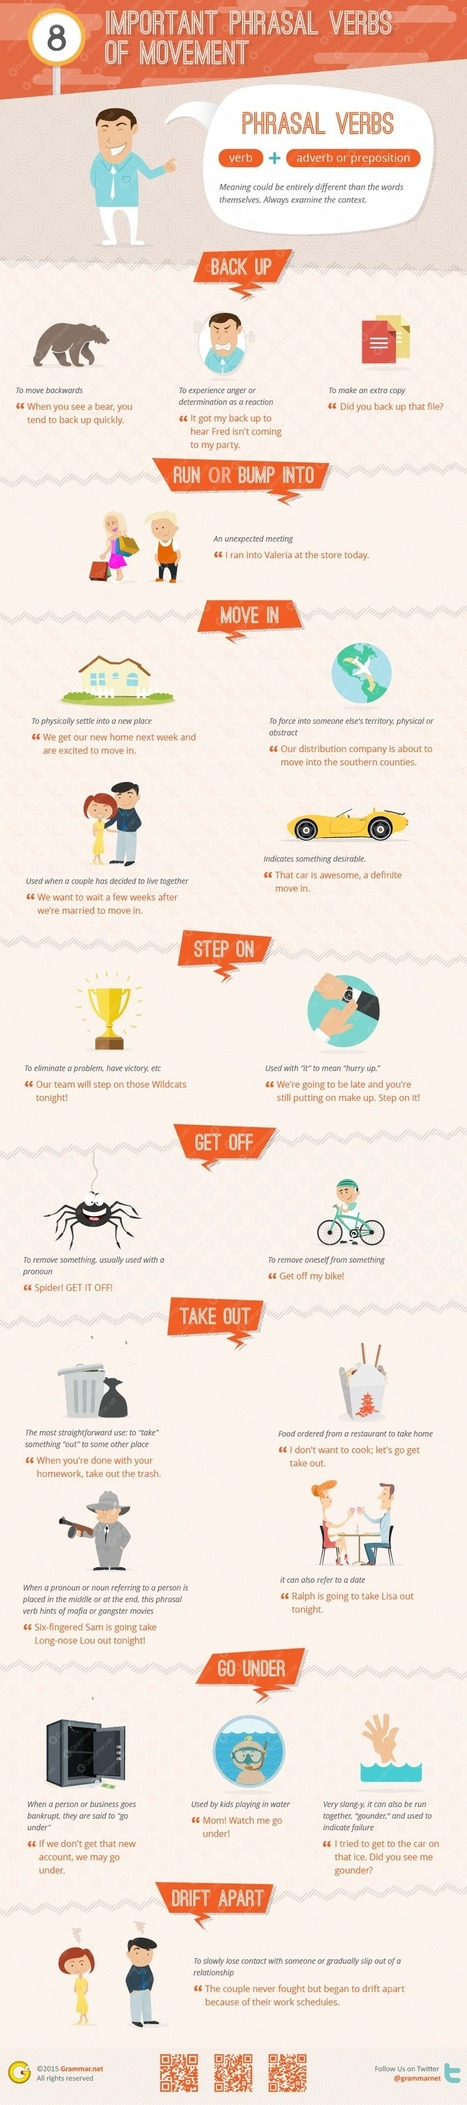 Aprende inglés: 8 phrasal verbs de movimiento #infografia #infographic #education | Aprendiendoaenseñar | Scoop.it